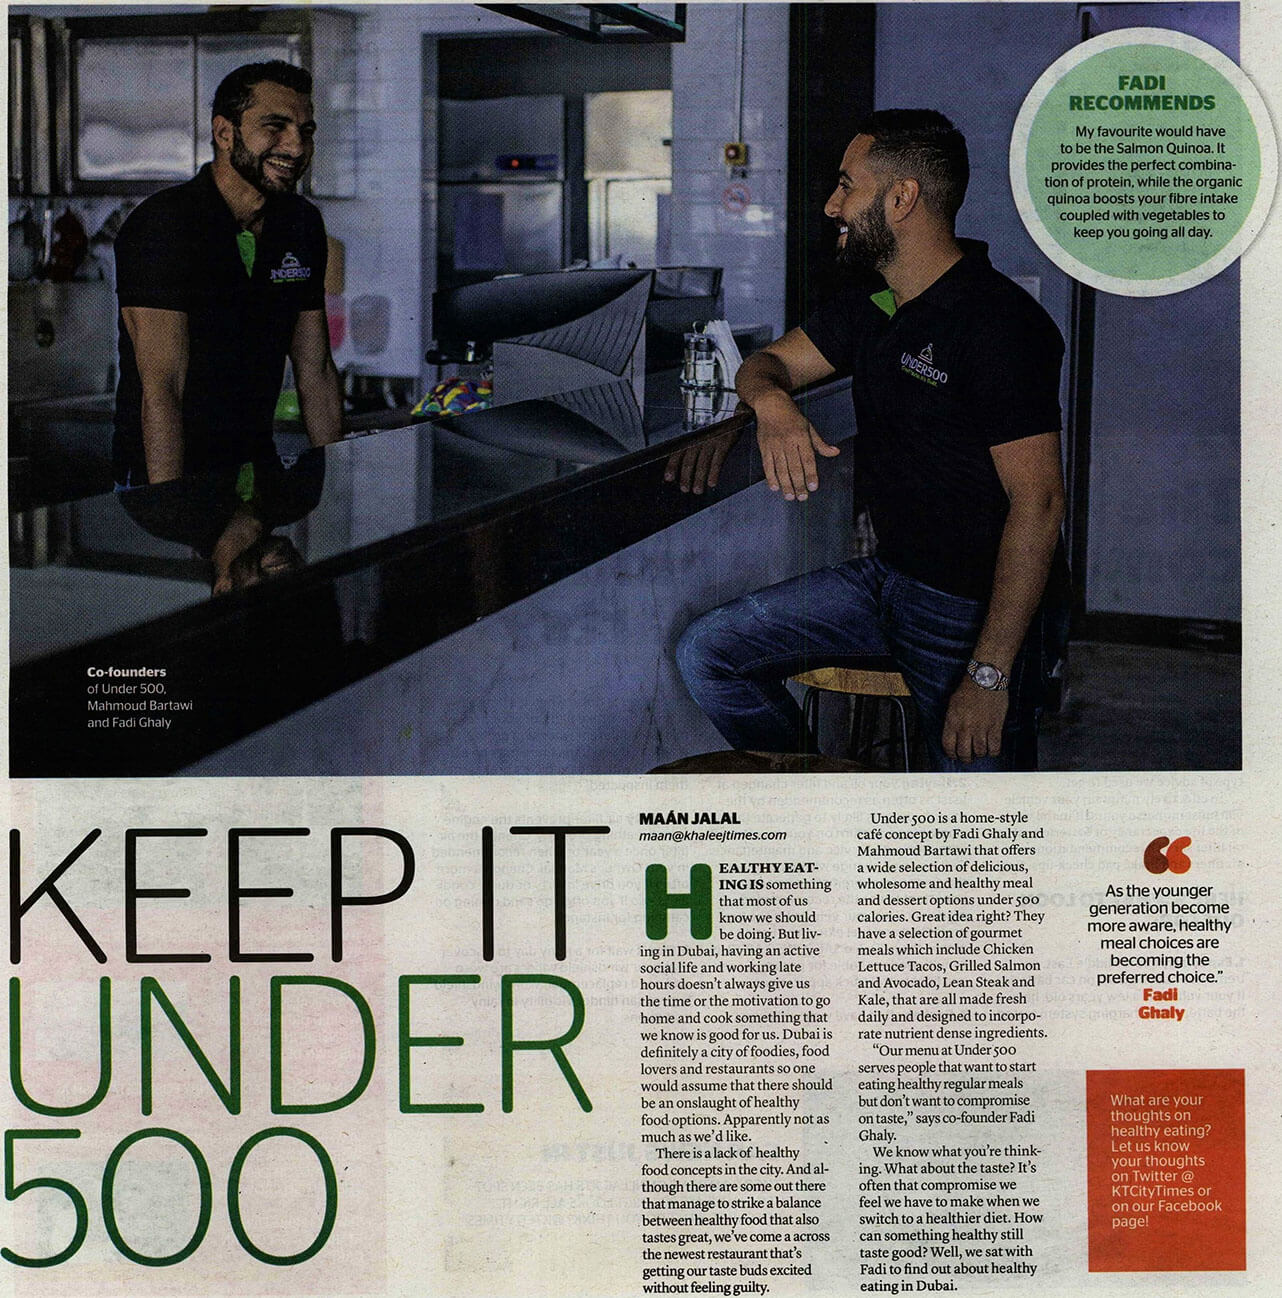 Under 500 - Khaleej Times City Times - 20 June 2016 - Page 6